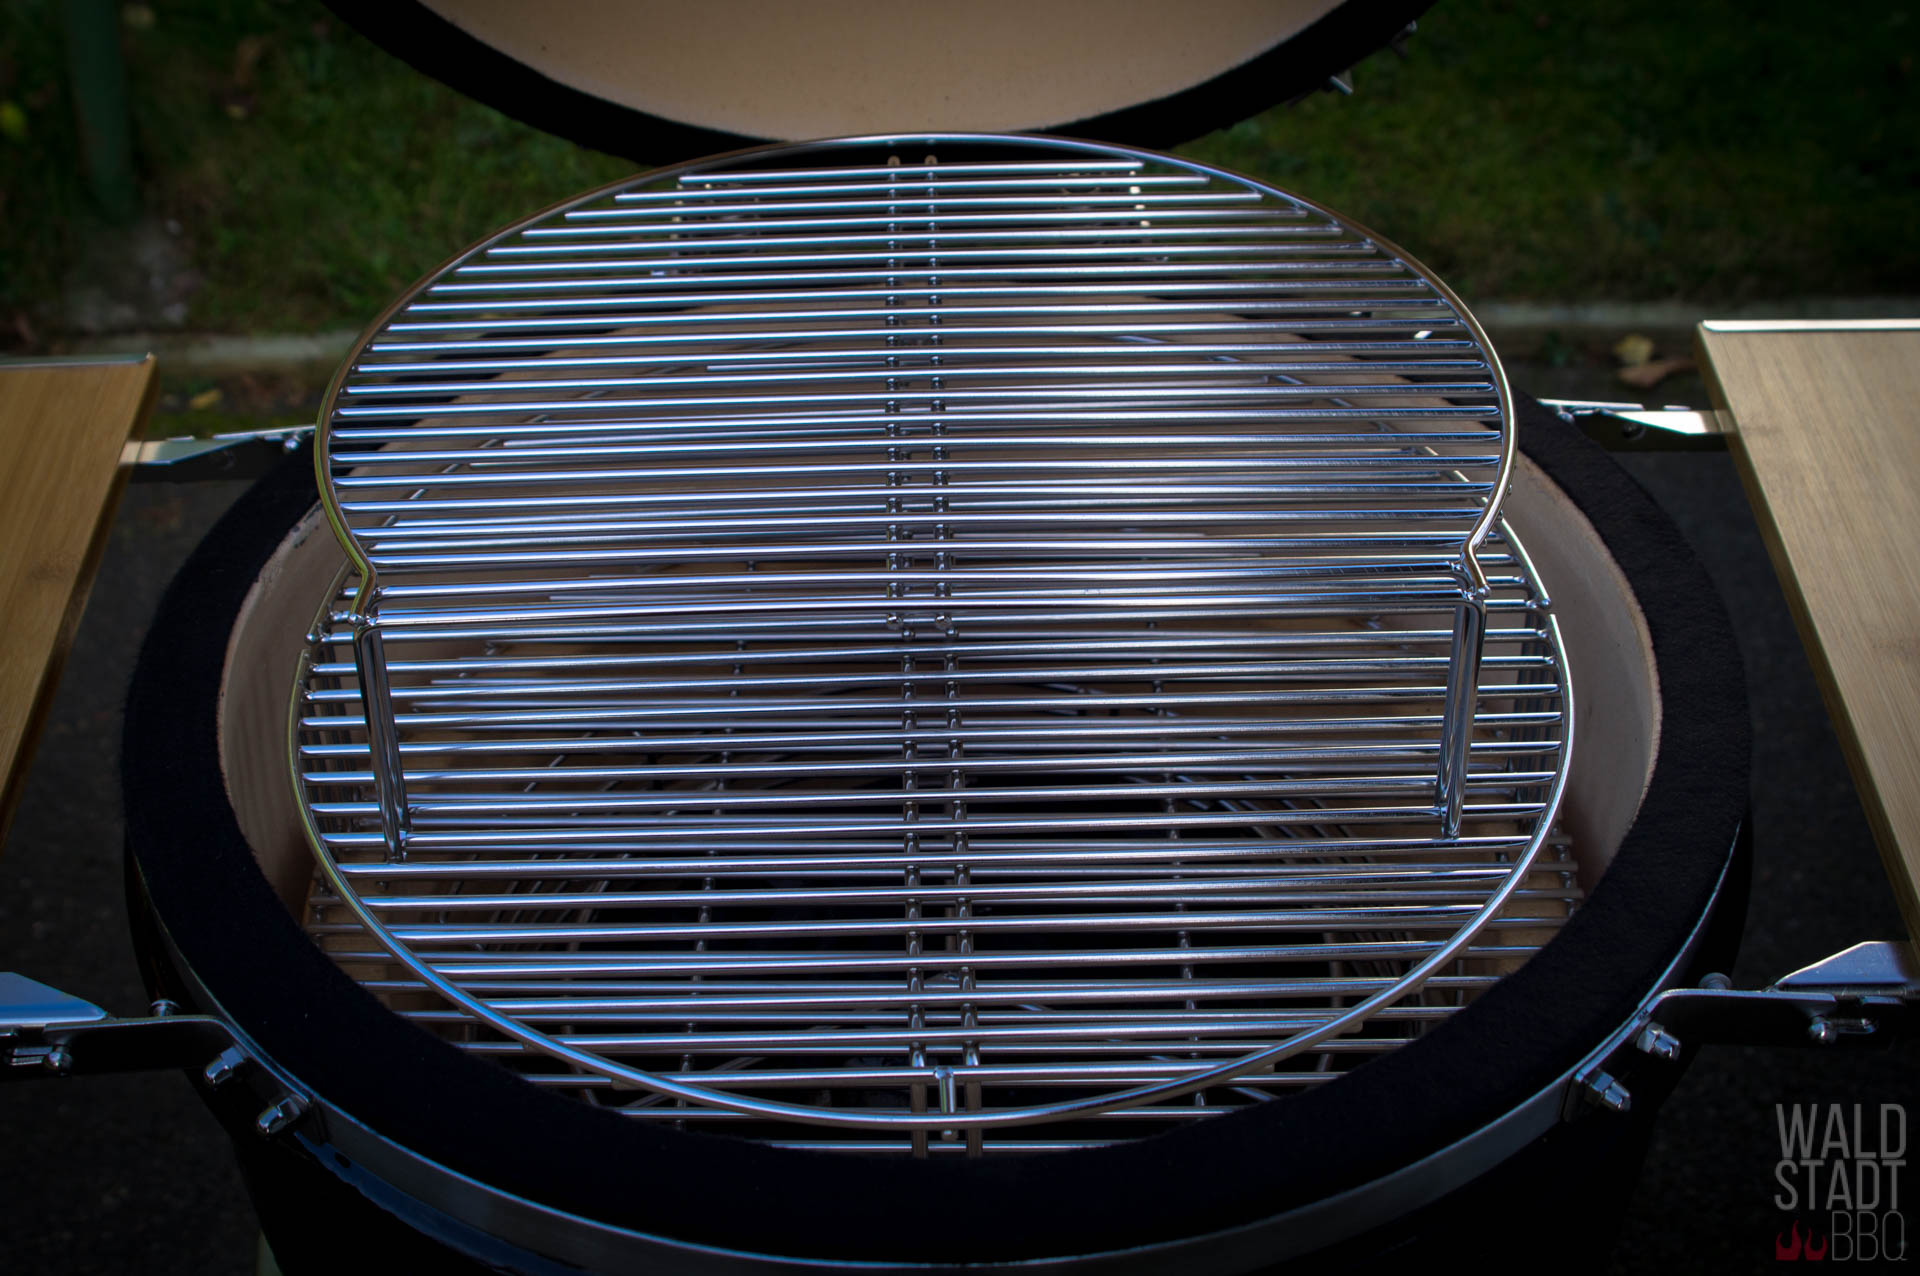 Enders Gasgrill Werksverkauf : Monolith classic grill in der bbq guru edition